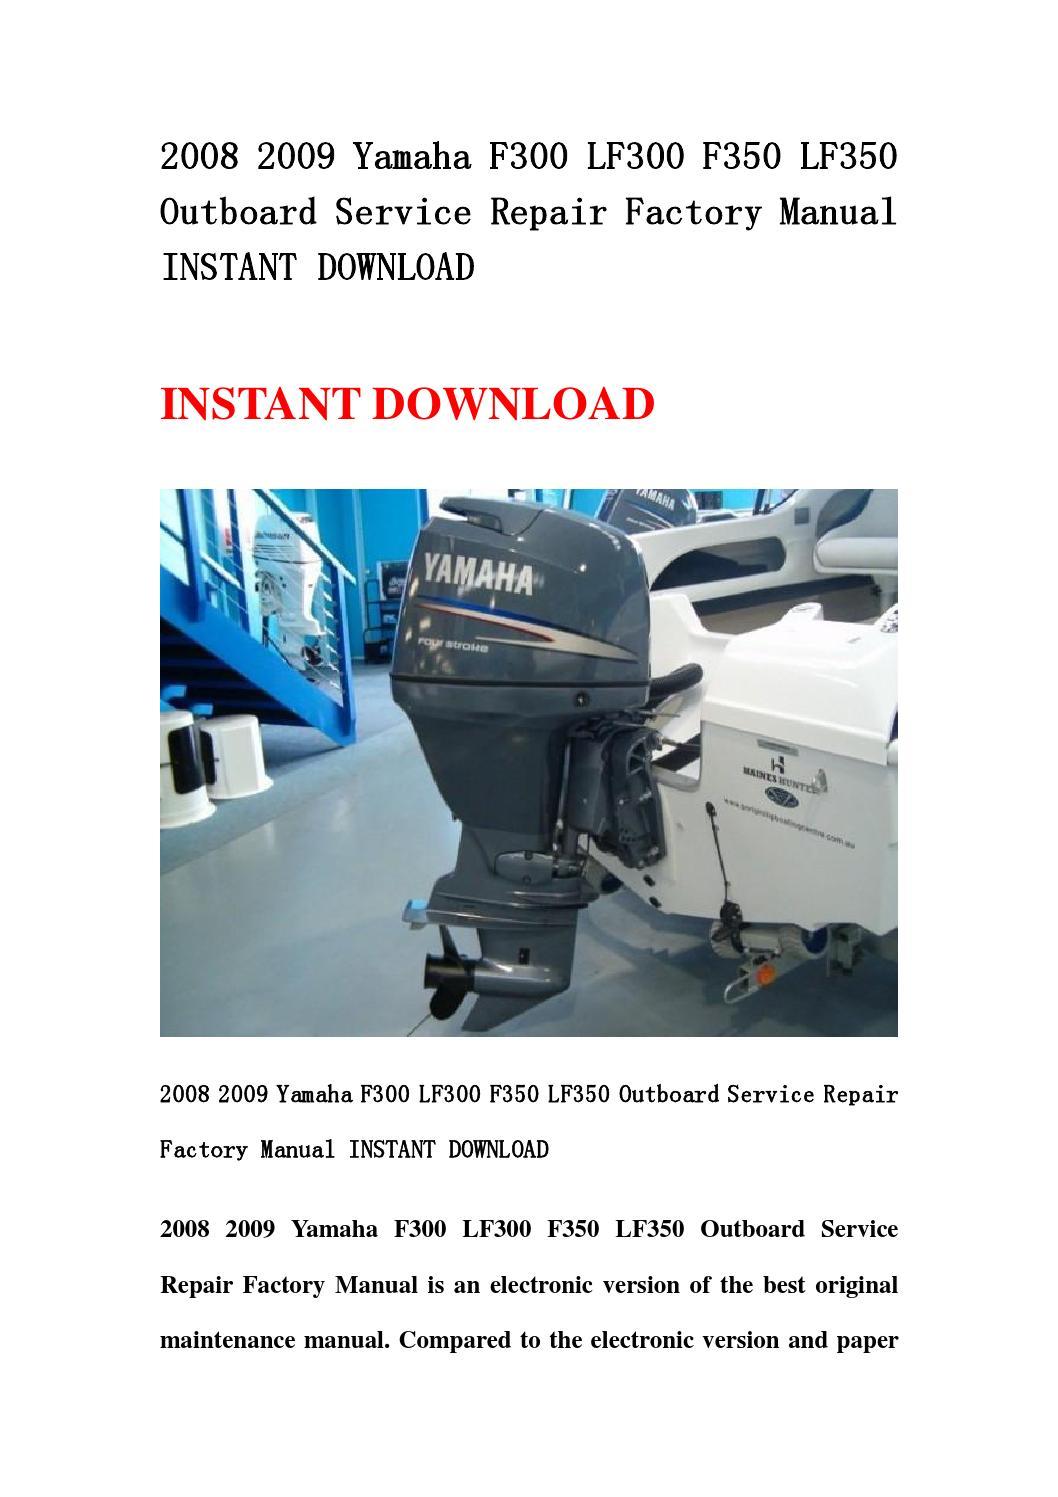 2008 2009 yamaha f300 lf300 f350 lf350 outboard service